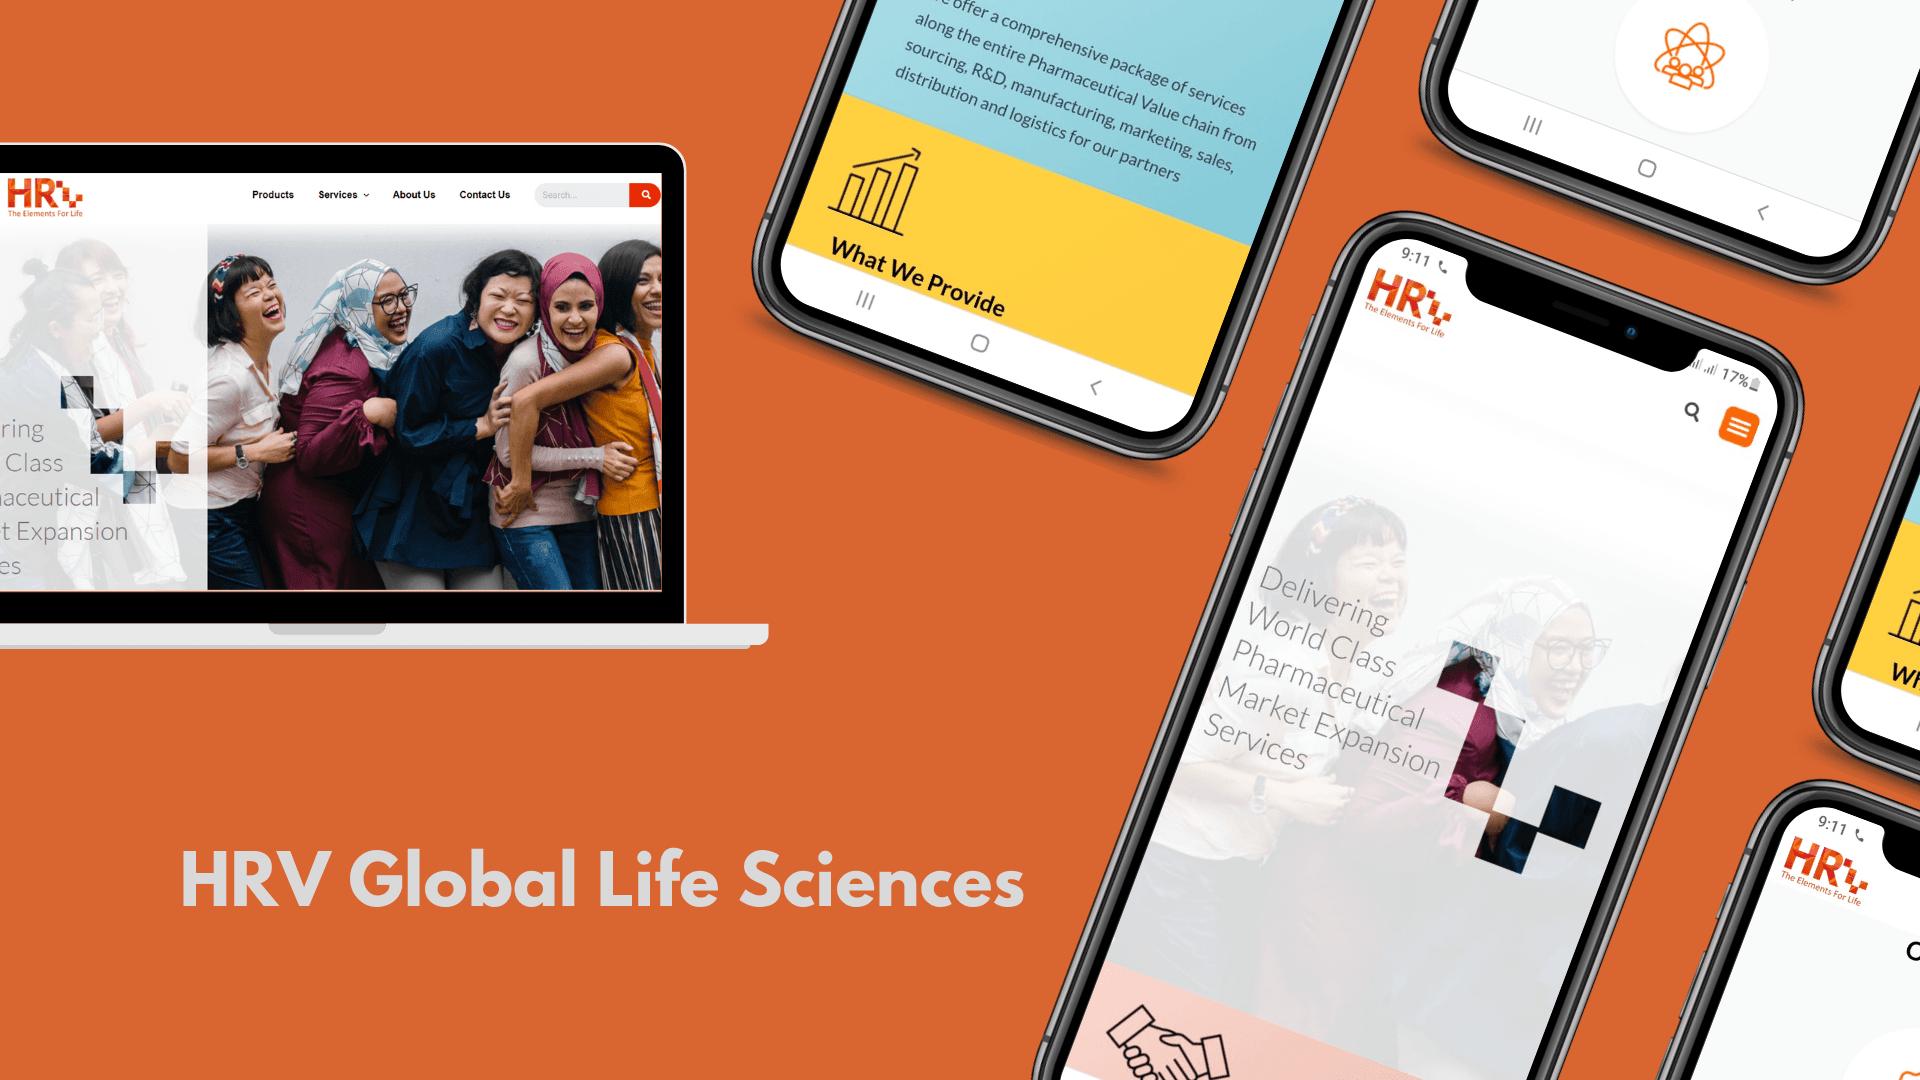 HRV Global Life Sciences